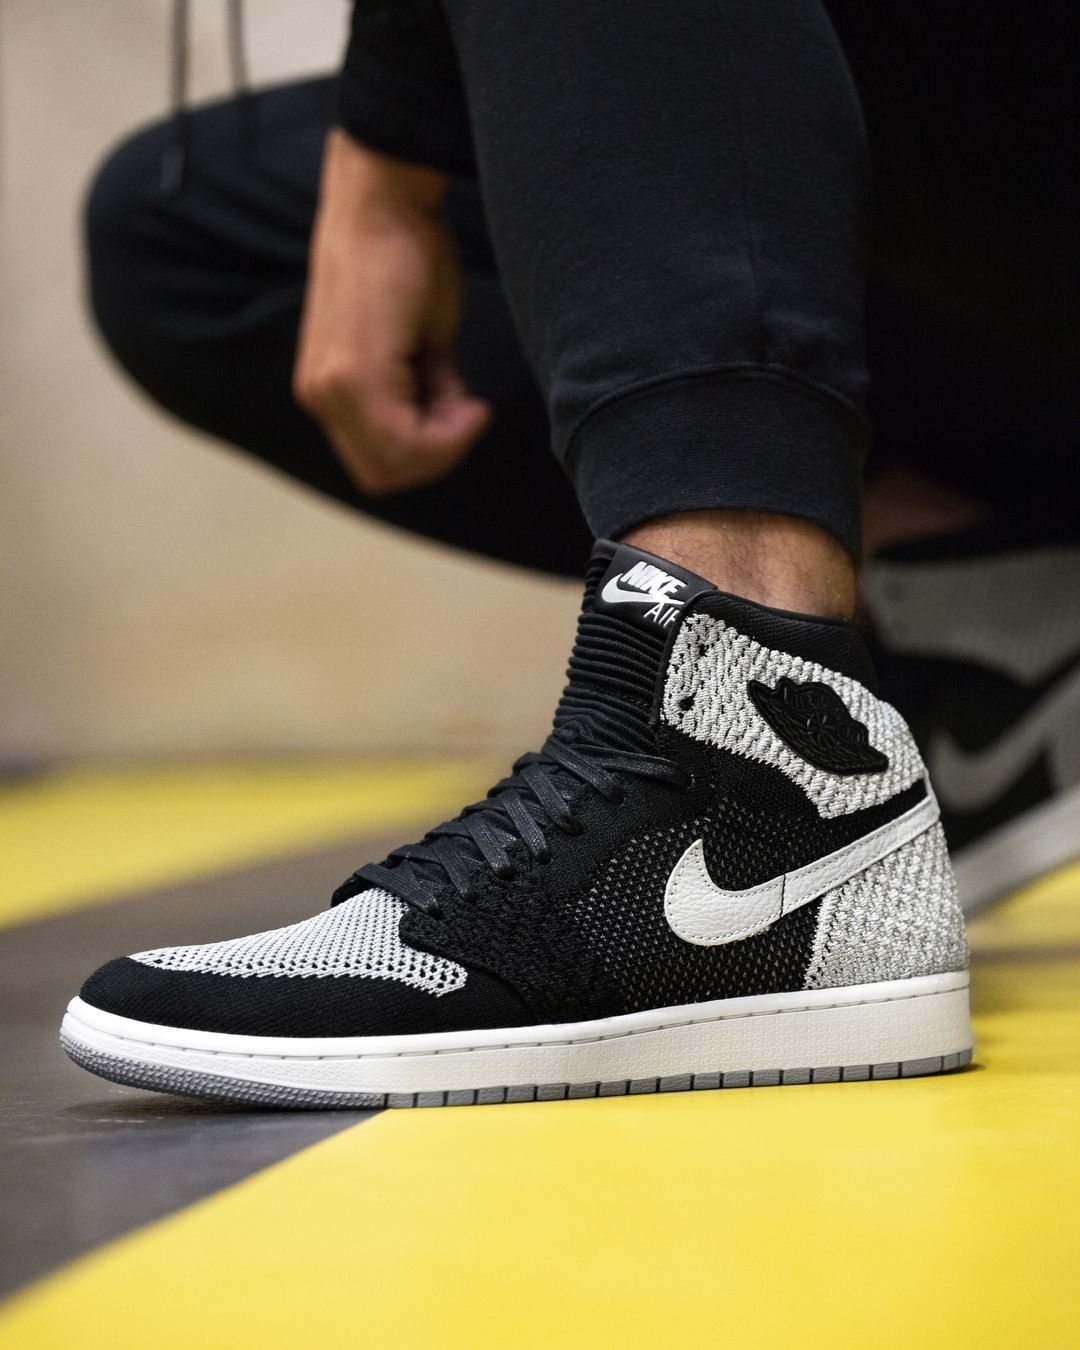 Nike Air Jordan 1 Flyknit Shadow Air Jordans Nike Jordans